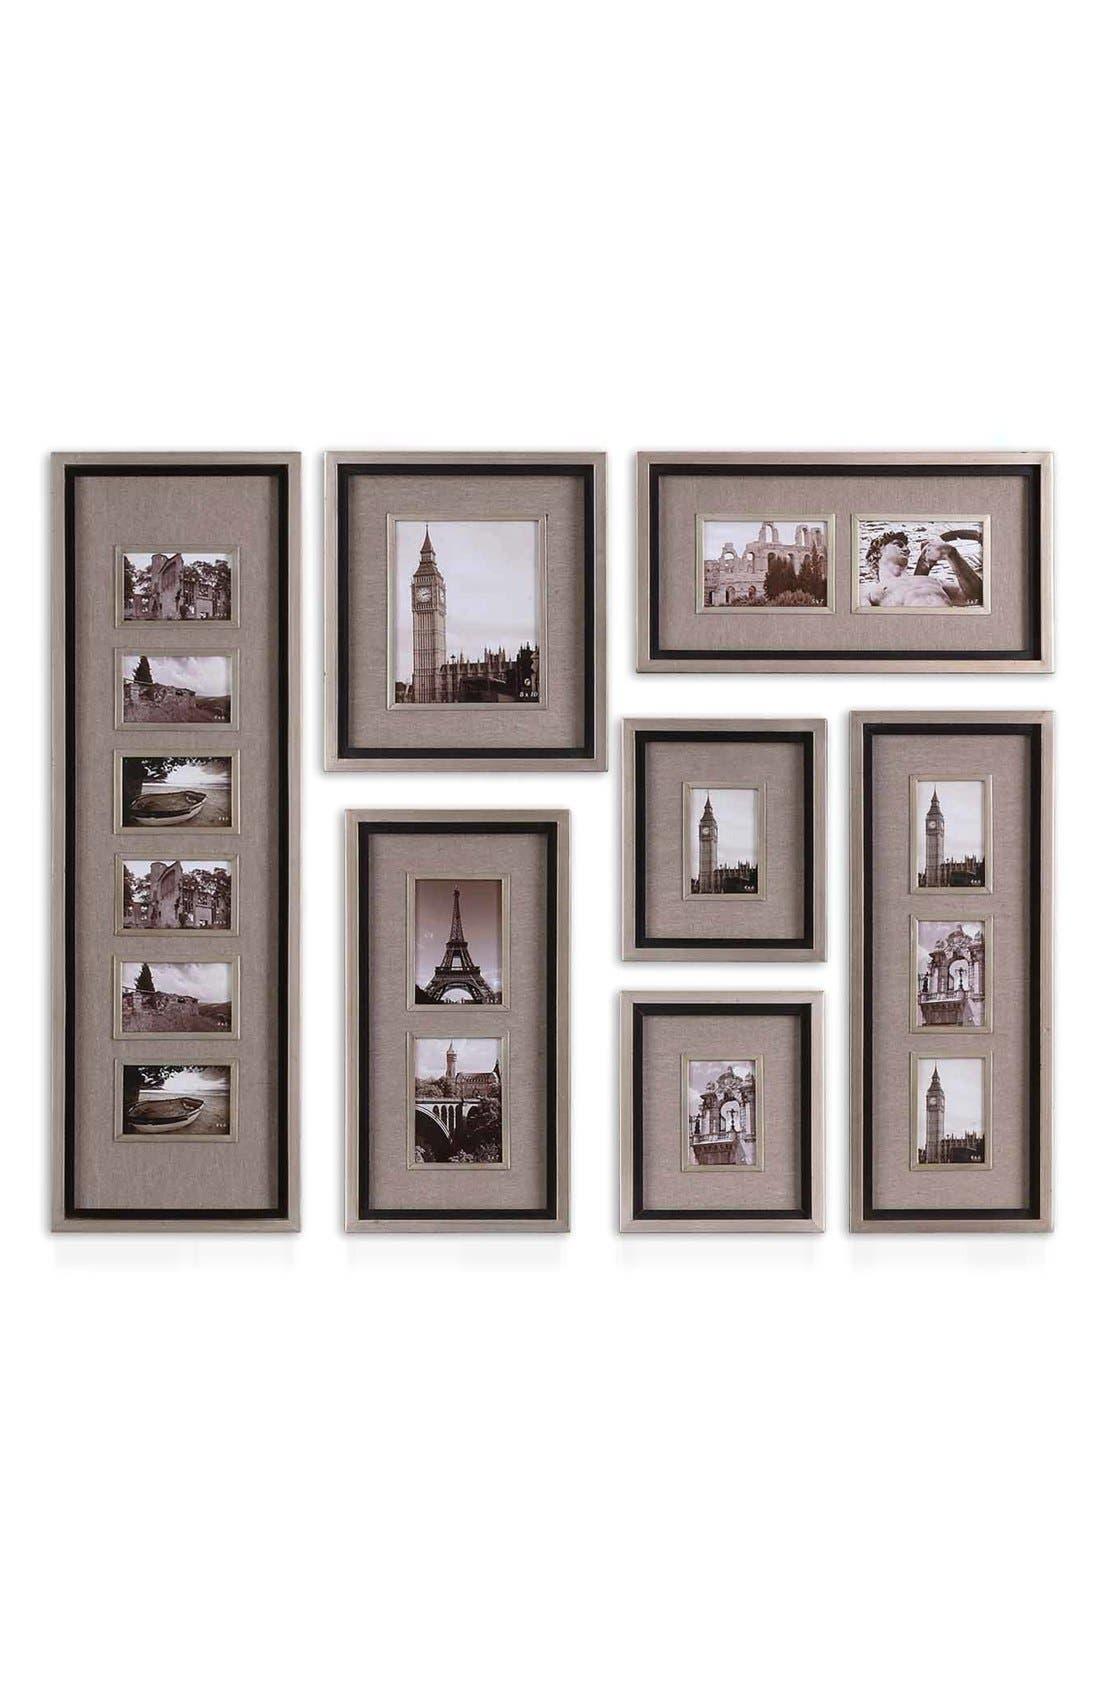 Alternate Image 1 Selected - Uttermost Massena Set of 7 Picture Frames